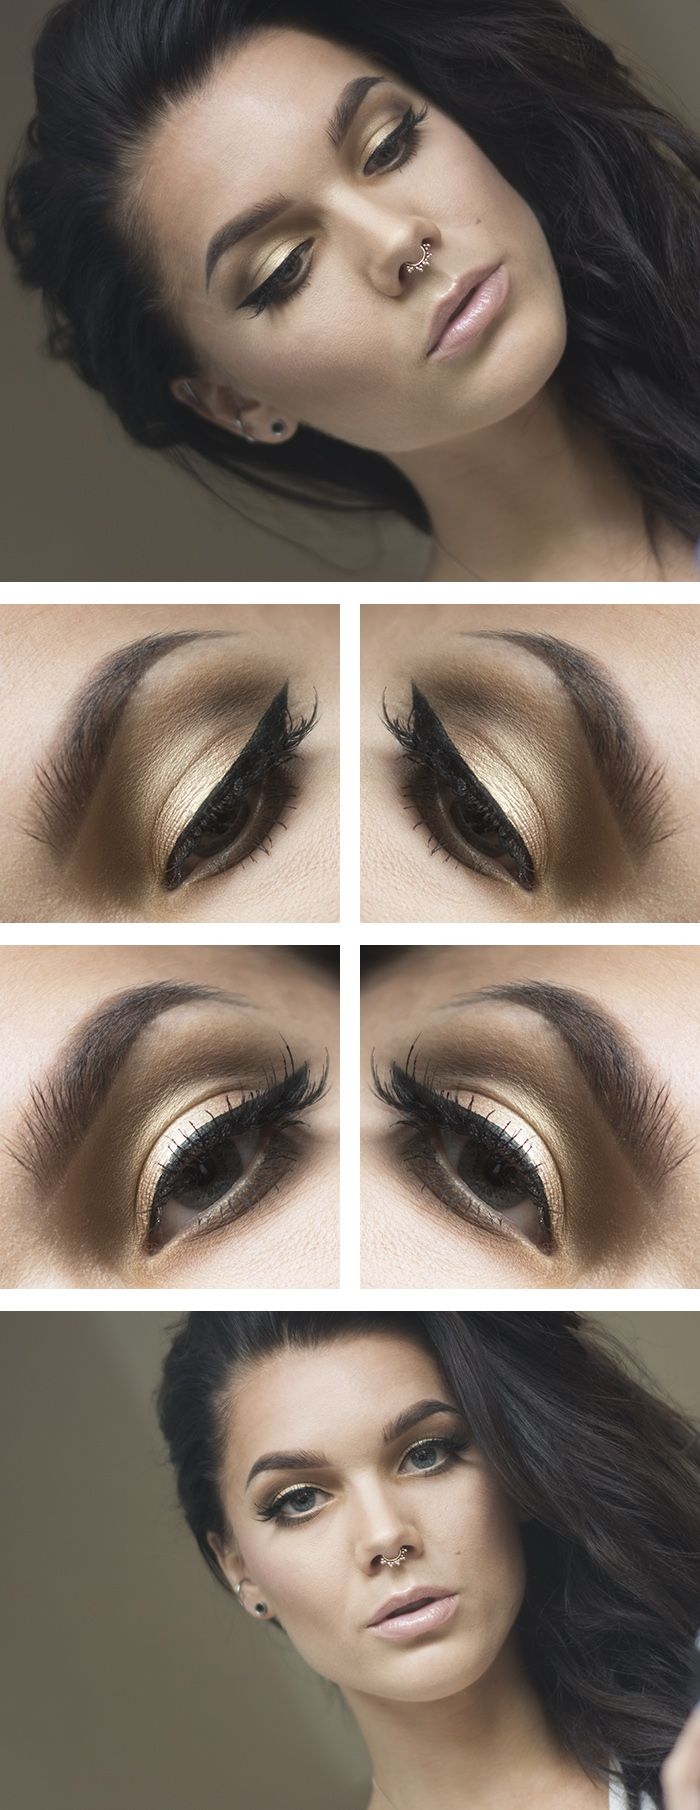 Luonnollinen kesämeikki | Light and bronzed summer makeup look by Linda Hallberg